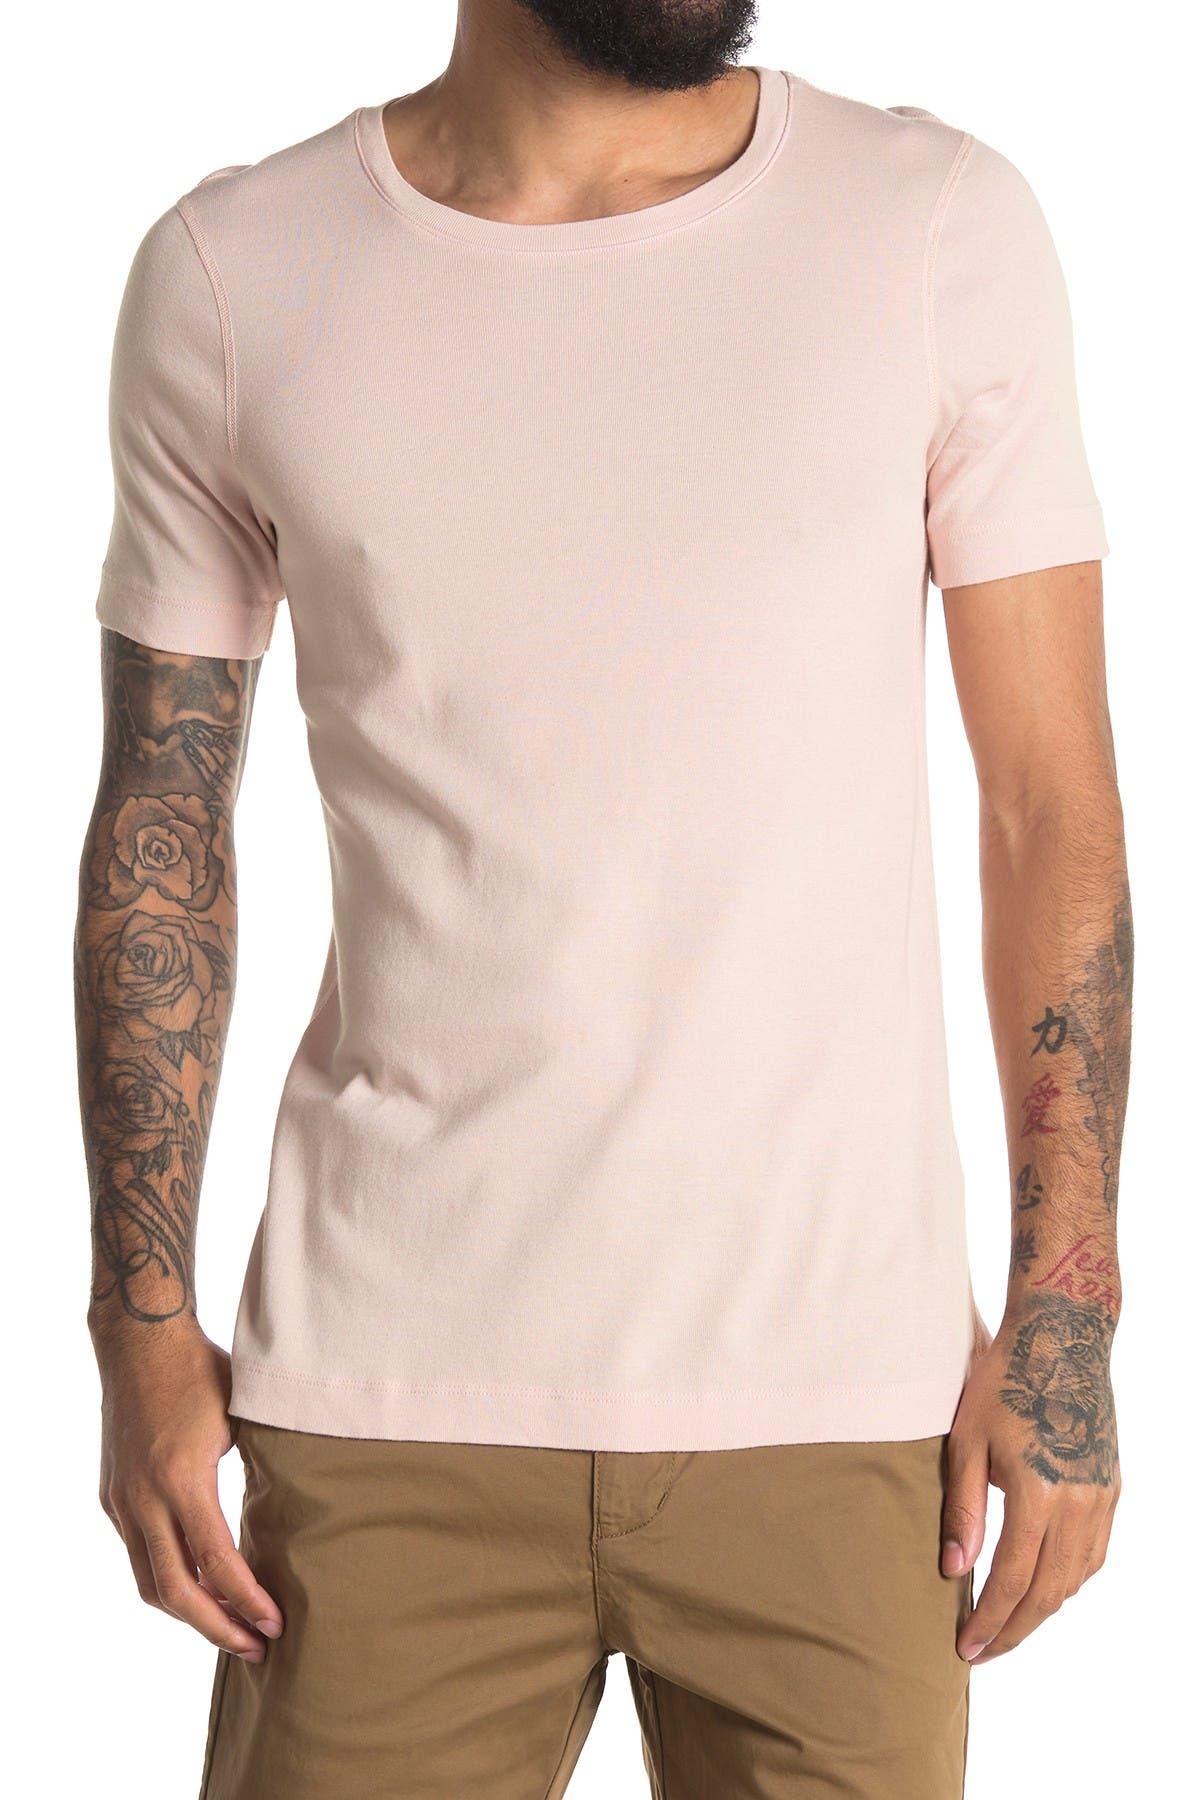 Image of Three Dots Short Sleeve Crew Neck T-Shirt